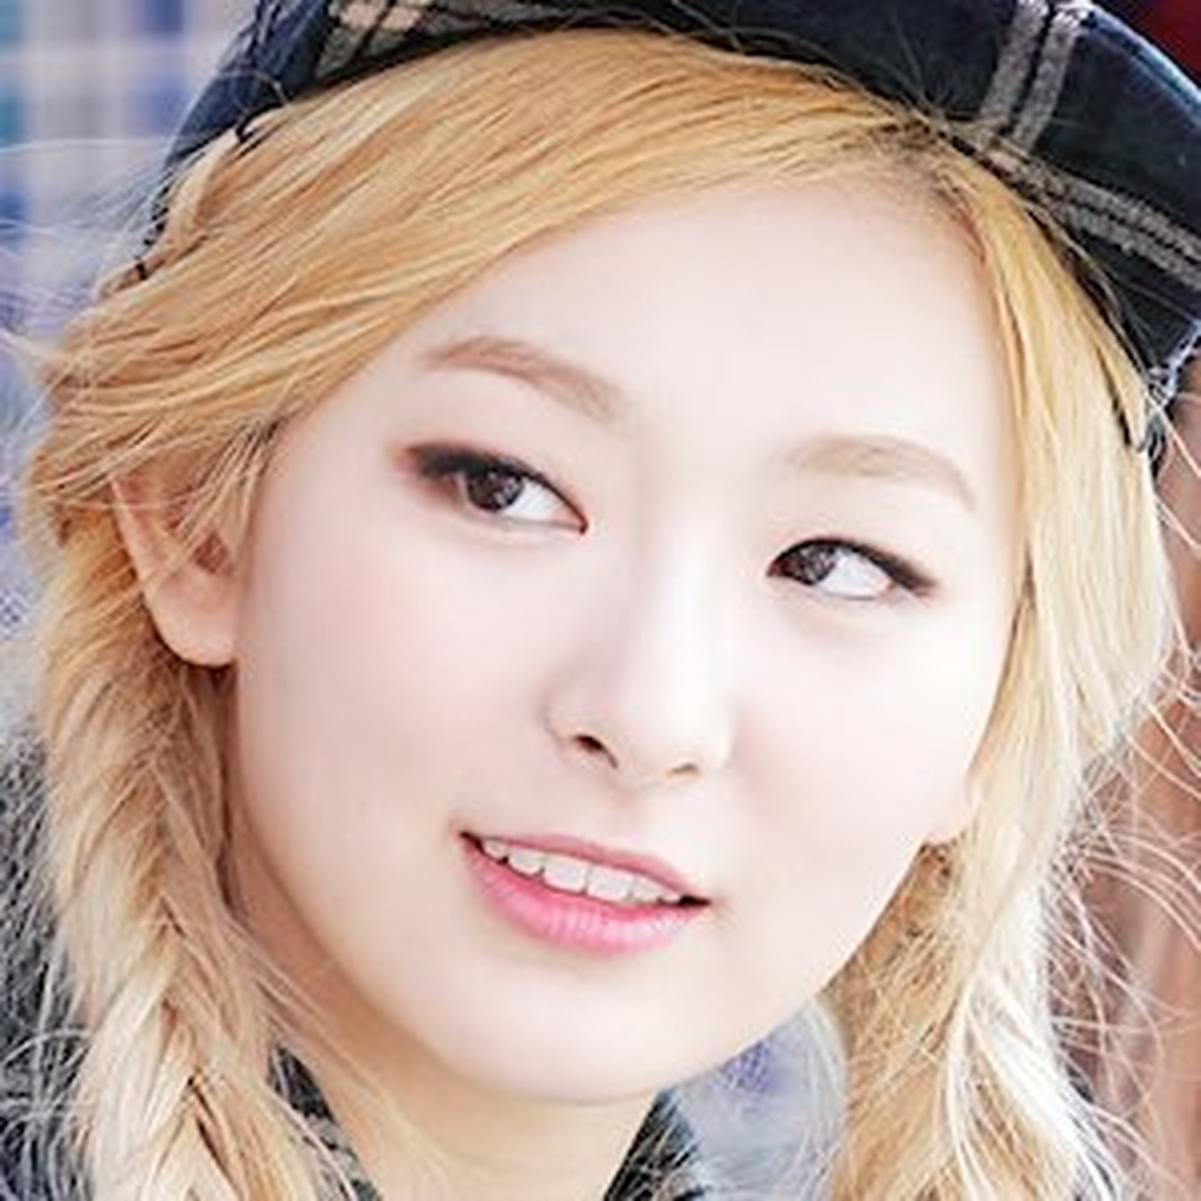 Seulgi wiki, Seulgi bio, Seulgi news